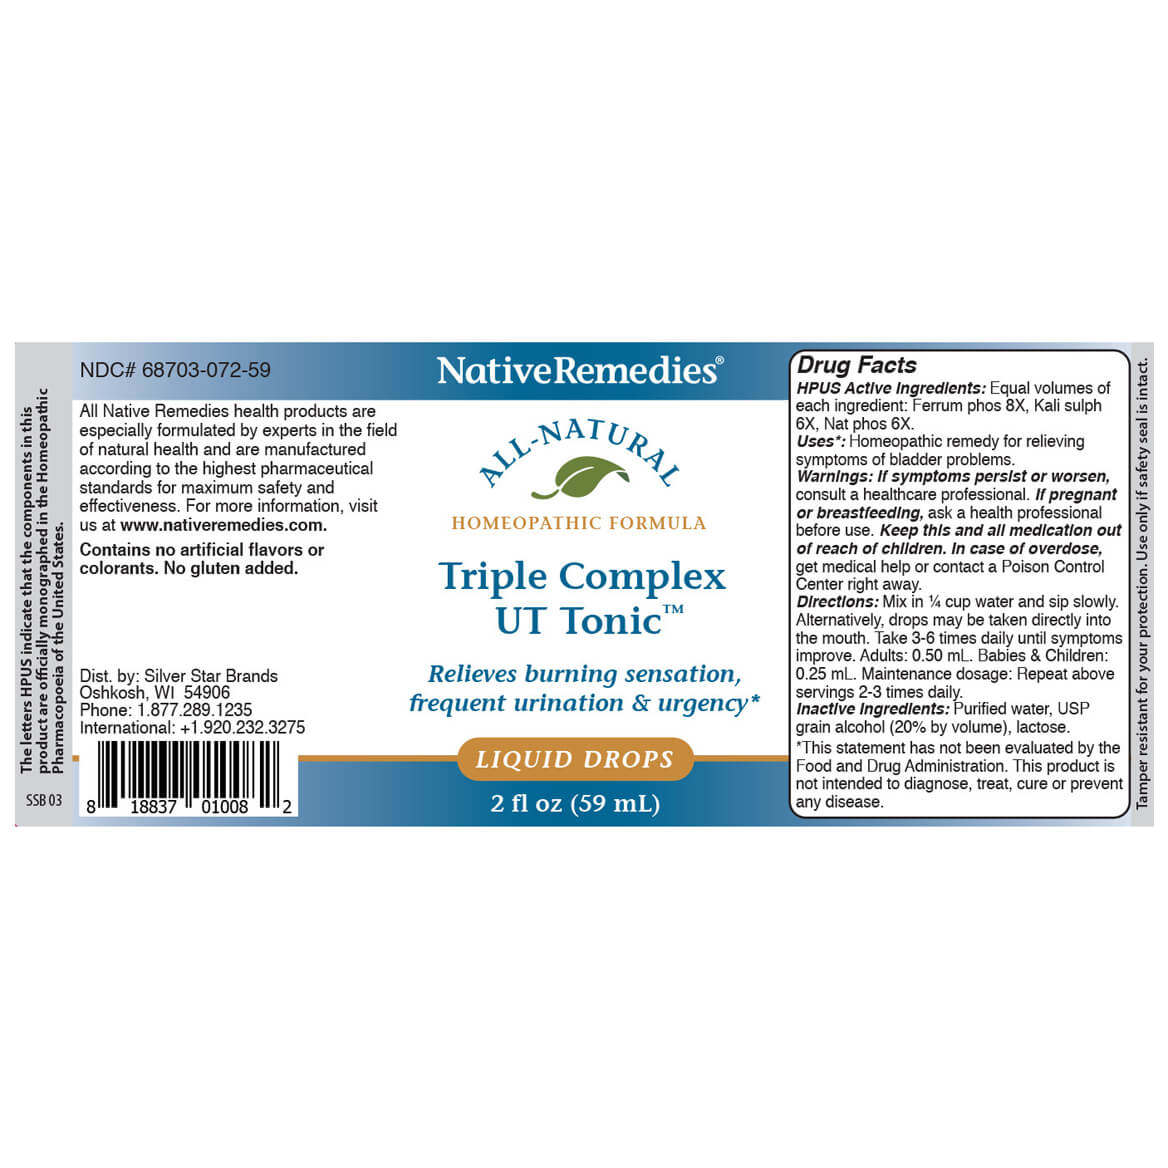 Triple Complex UT Tonic™ for Bladder Irritation-351884